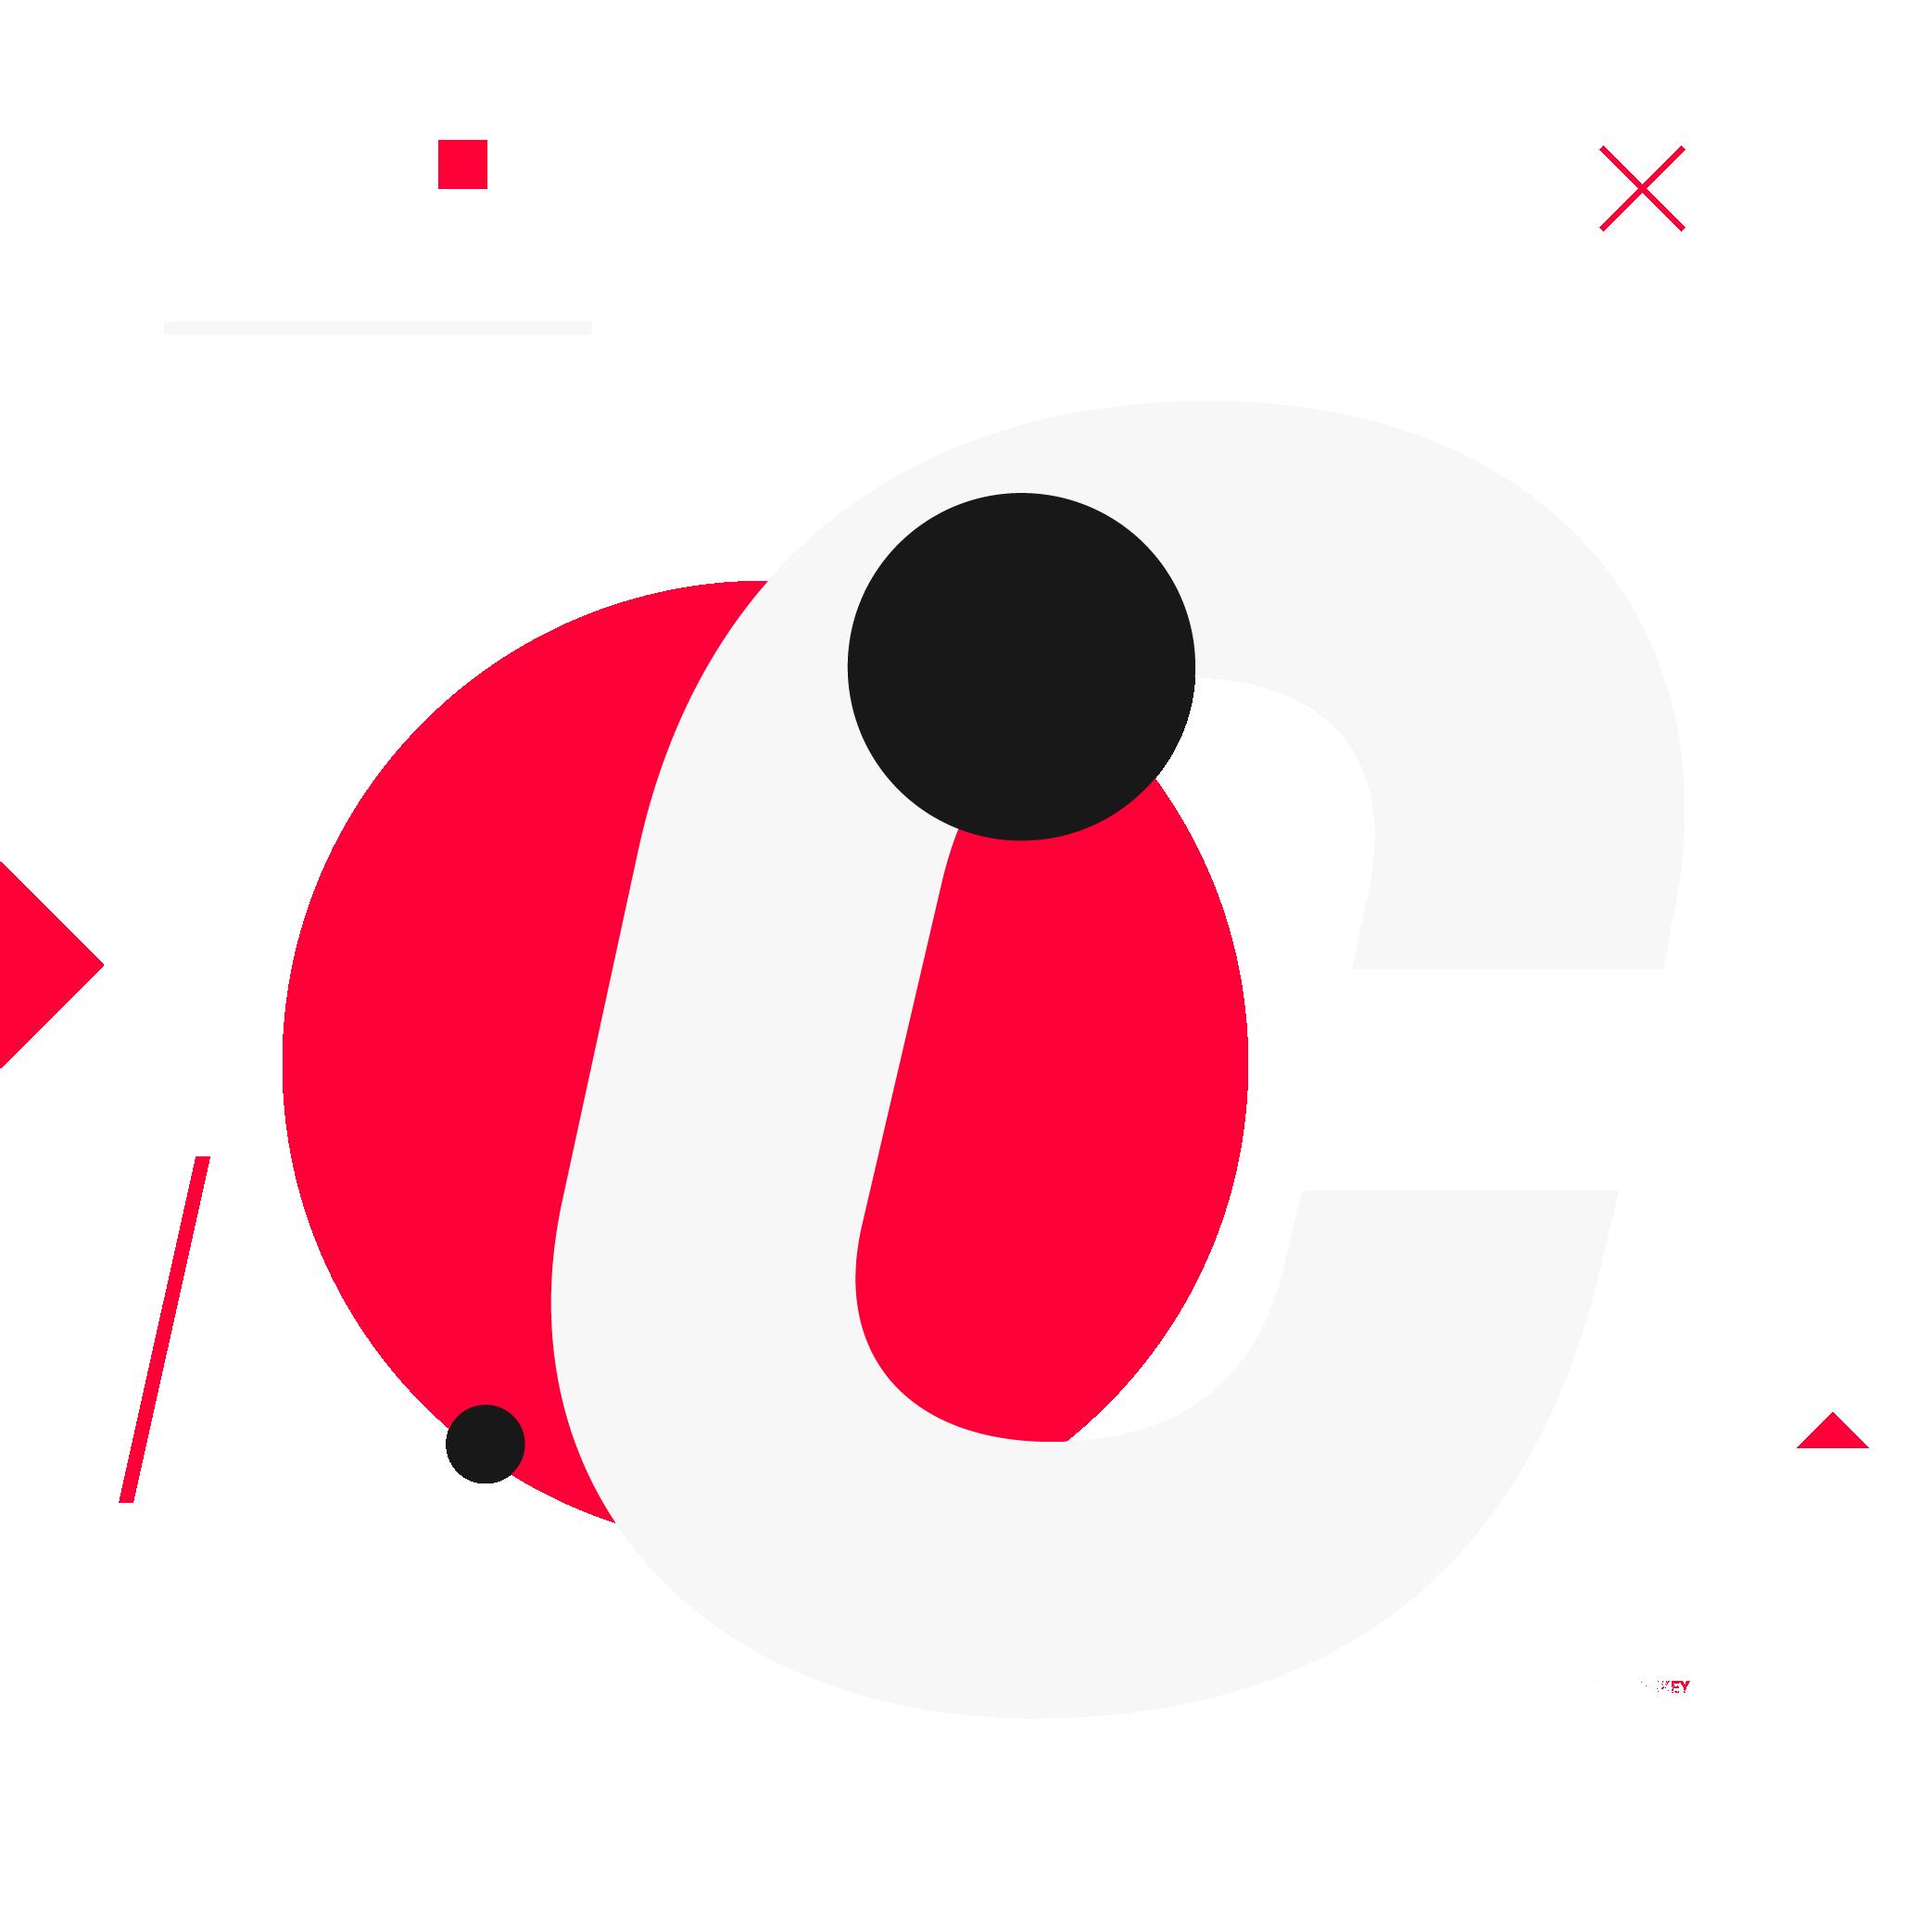 Graphic with a C representing creativit